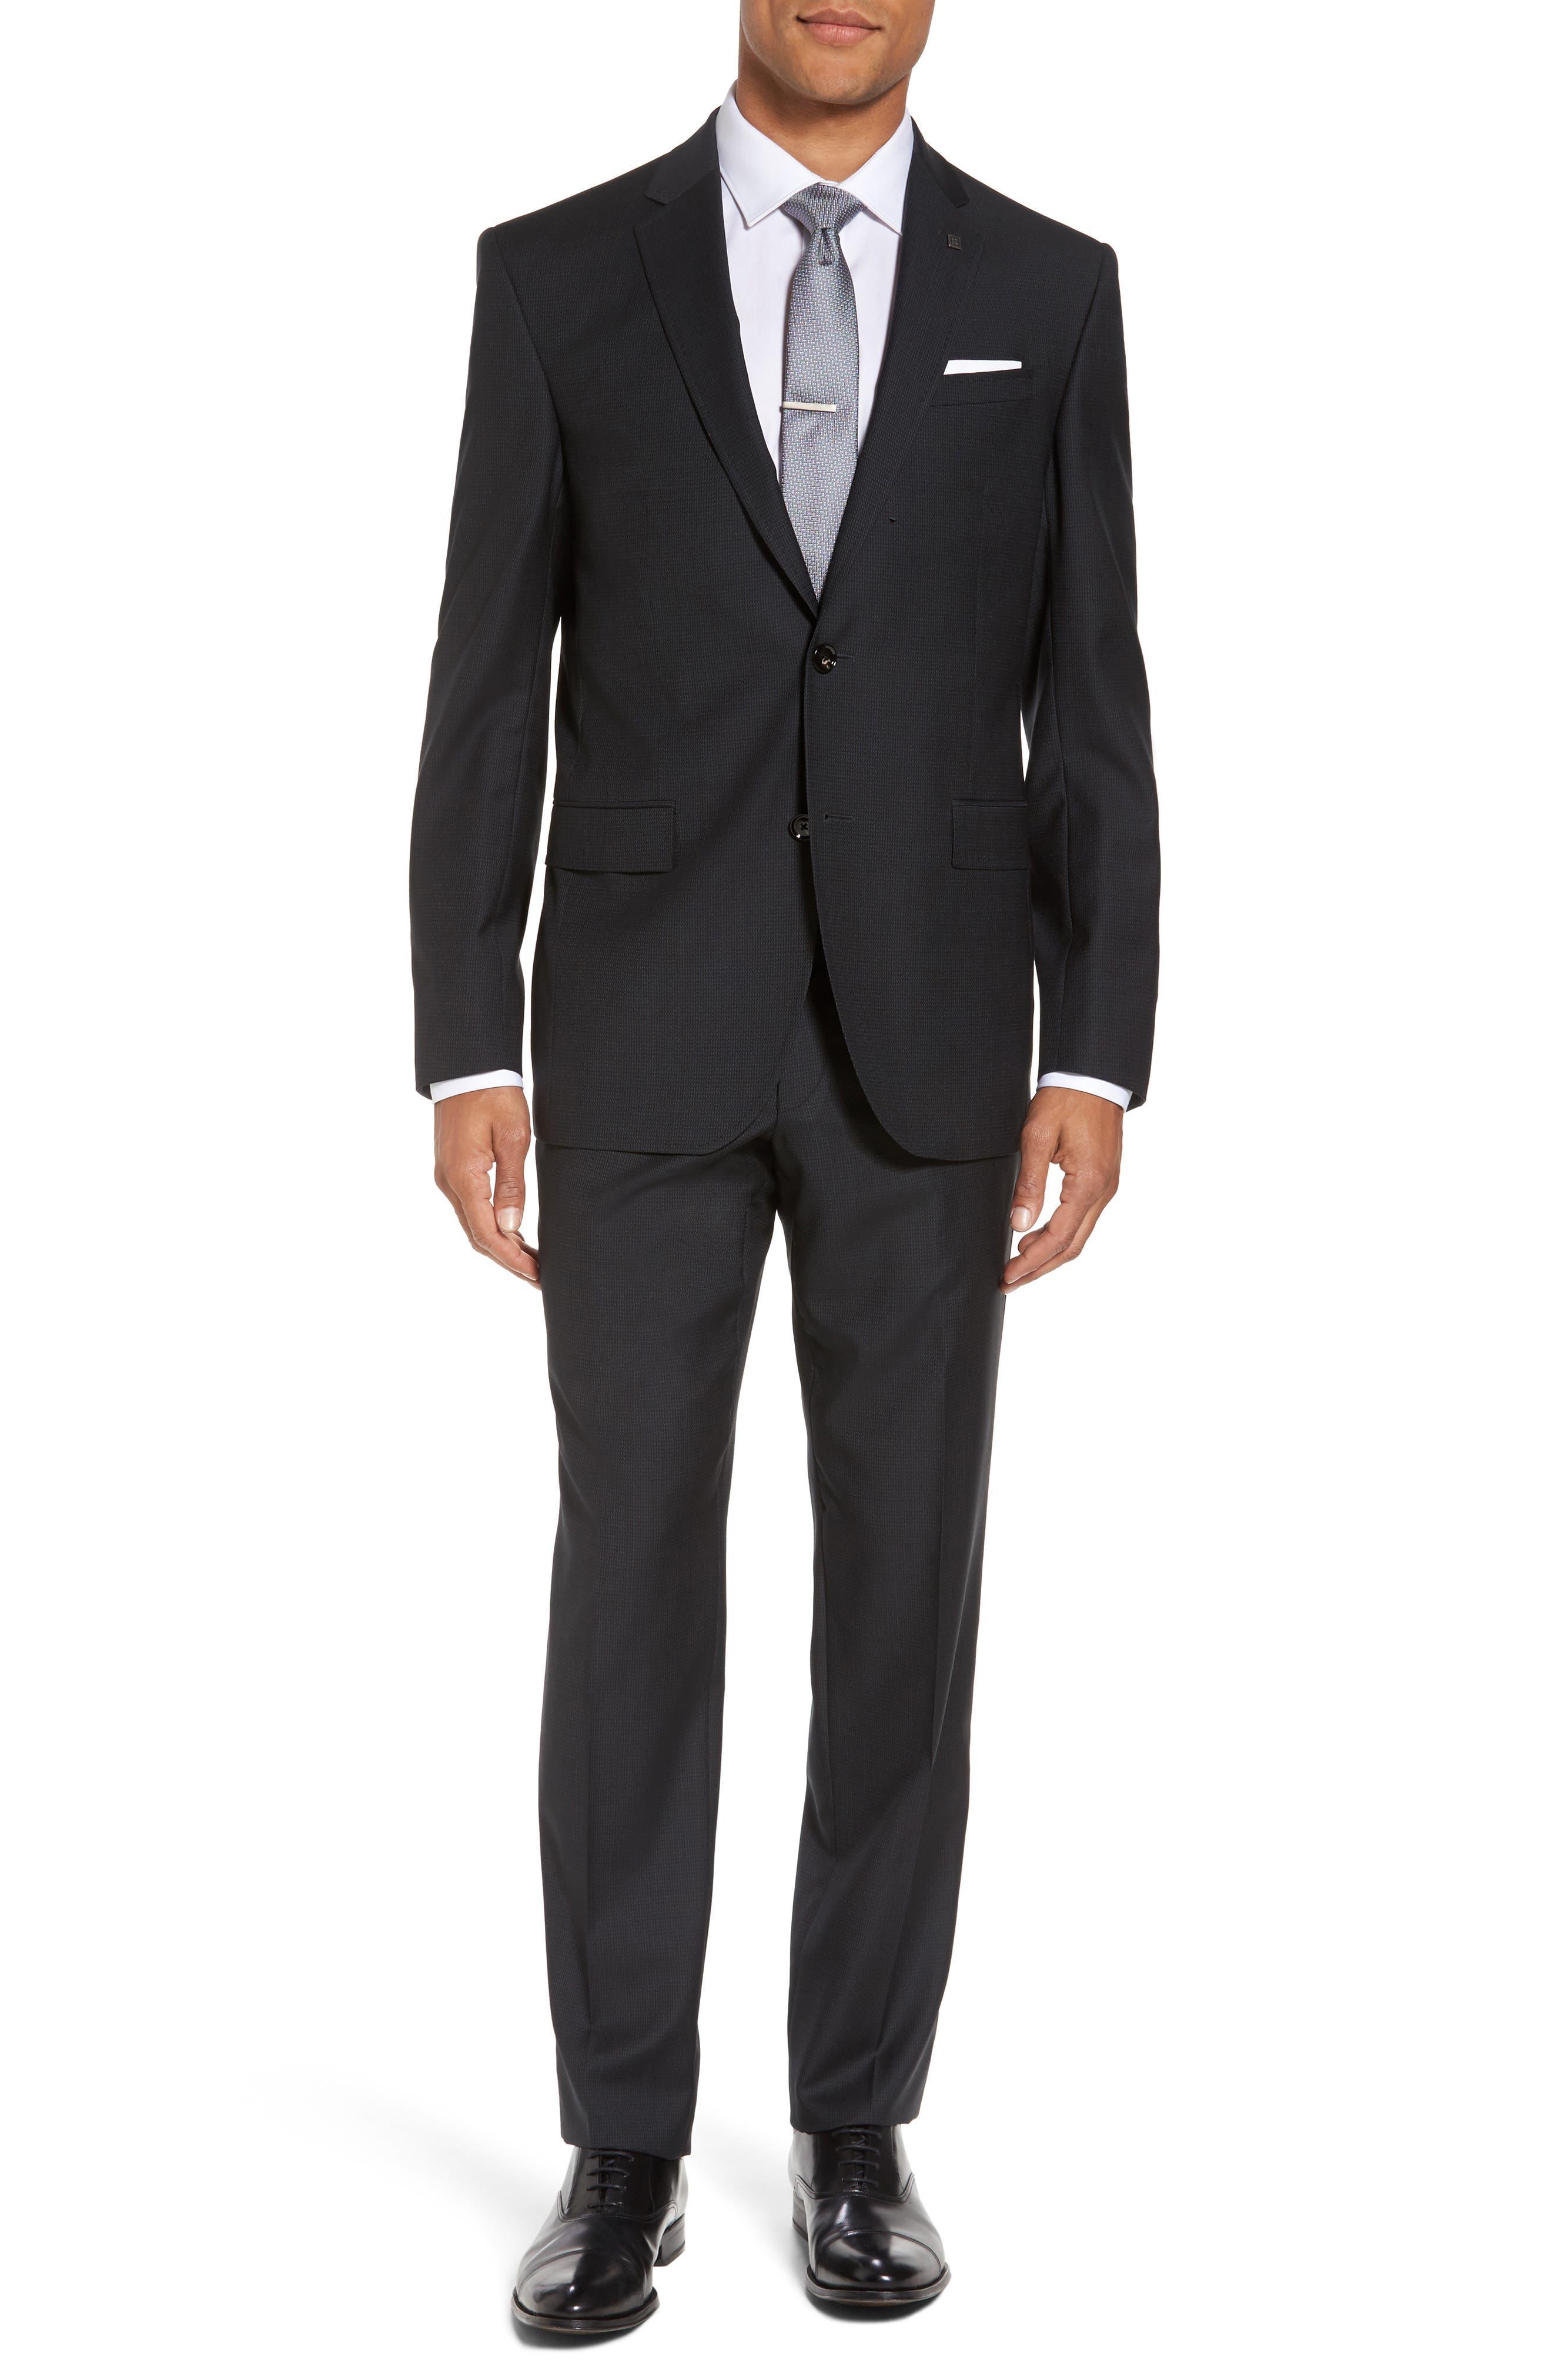 Jay Trim Fit Solid Wool Suit,                         Main,                         color, 001